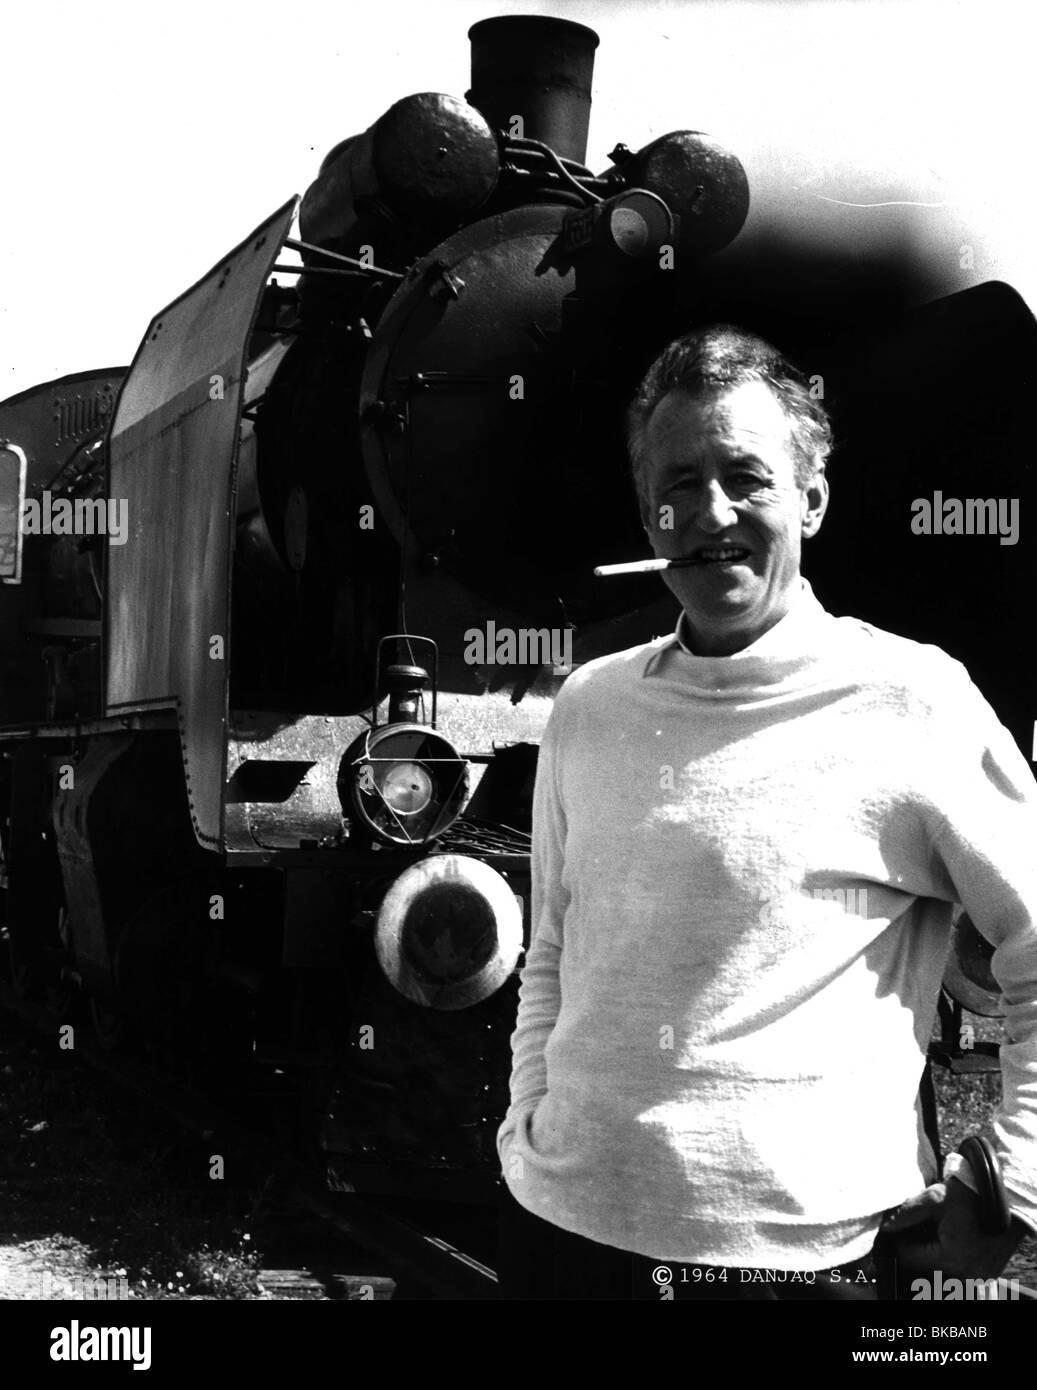 IAN FLEMING (WRI) PORTRAIT 1964 - Stock Image